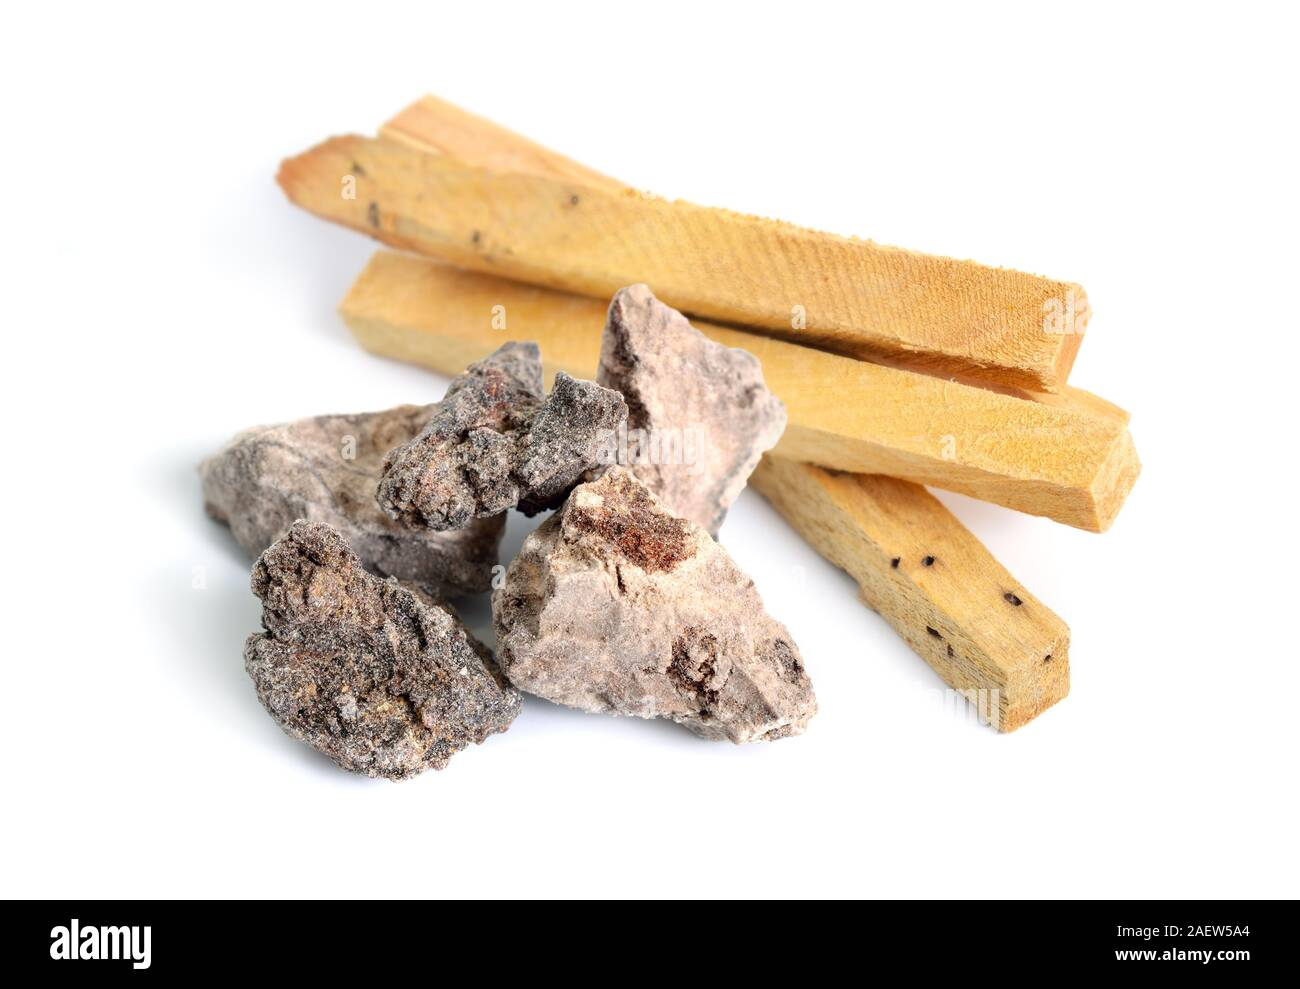 Palo Santo Holy Wood Sticks Wit Incense Resin Isolated On White Background Stock Photo Alamy